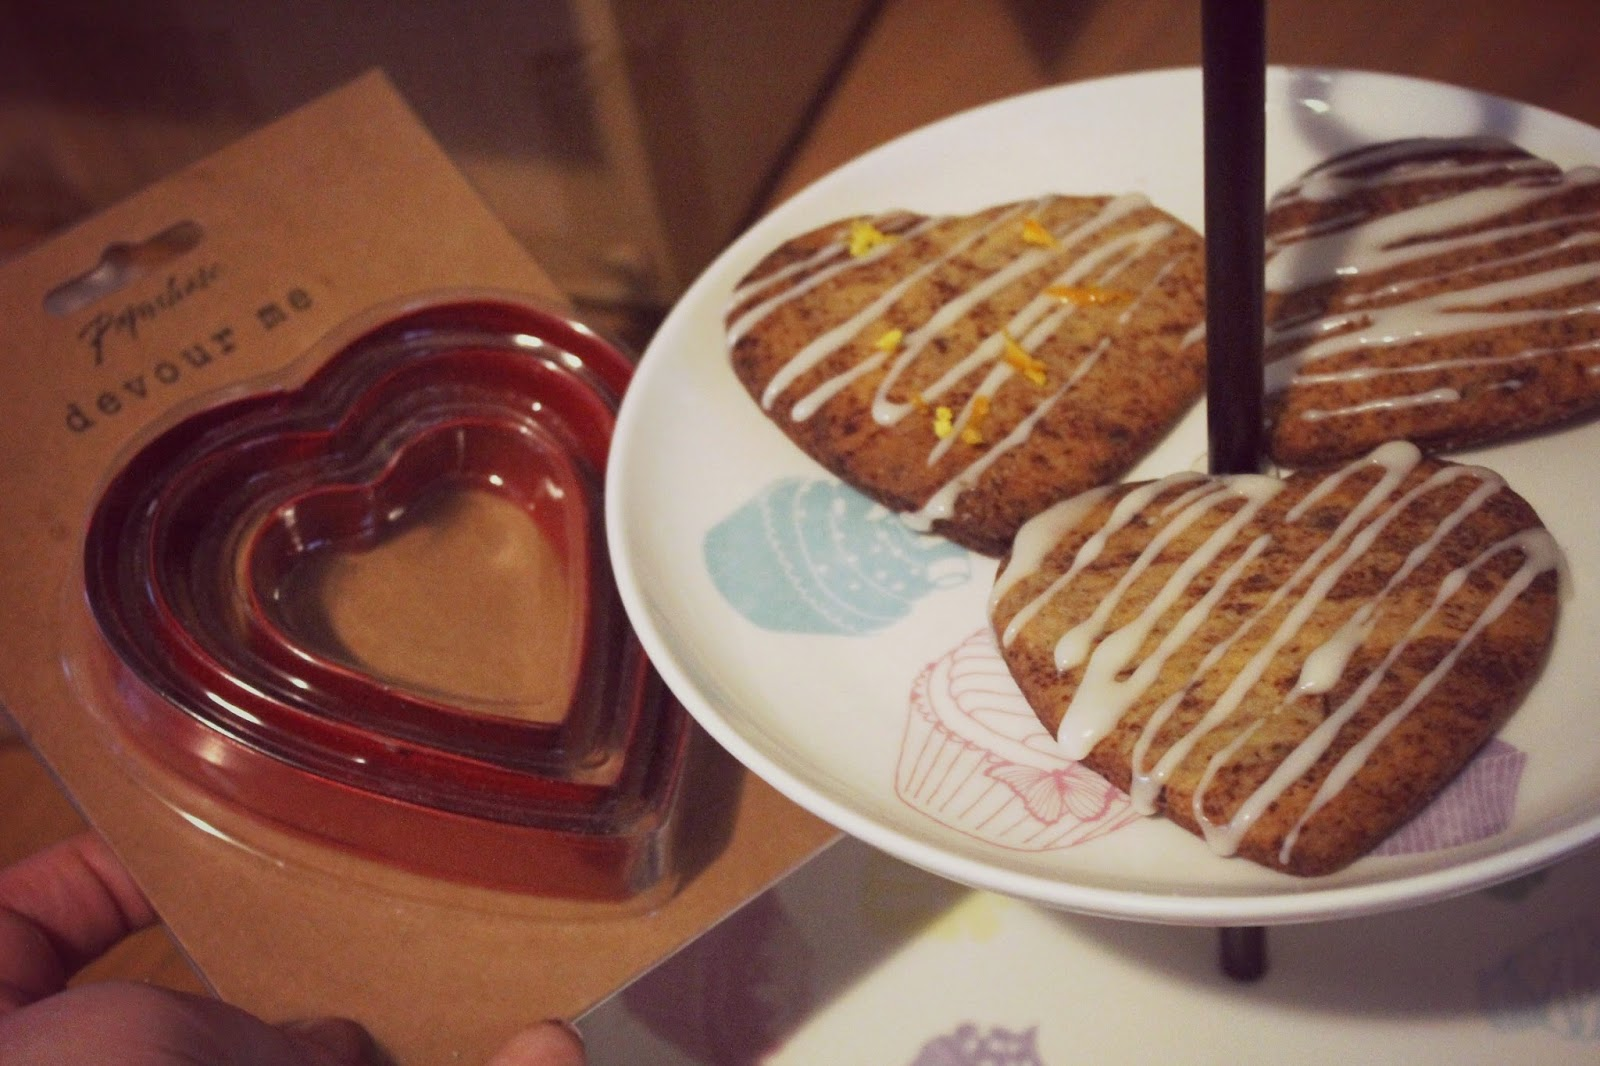 choc orange heart shaped biscuits